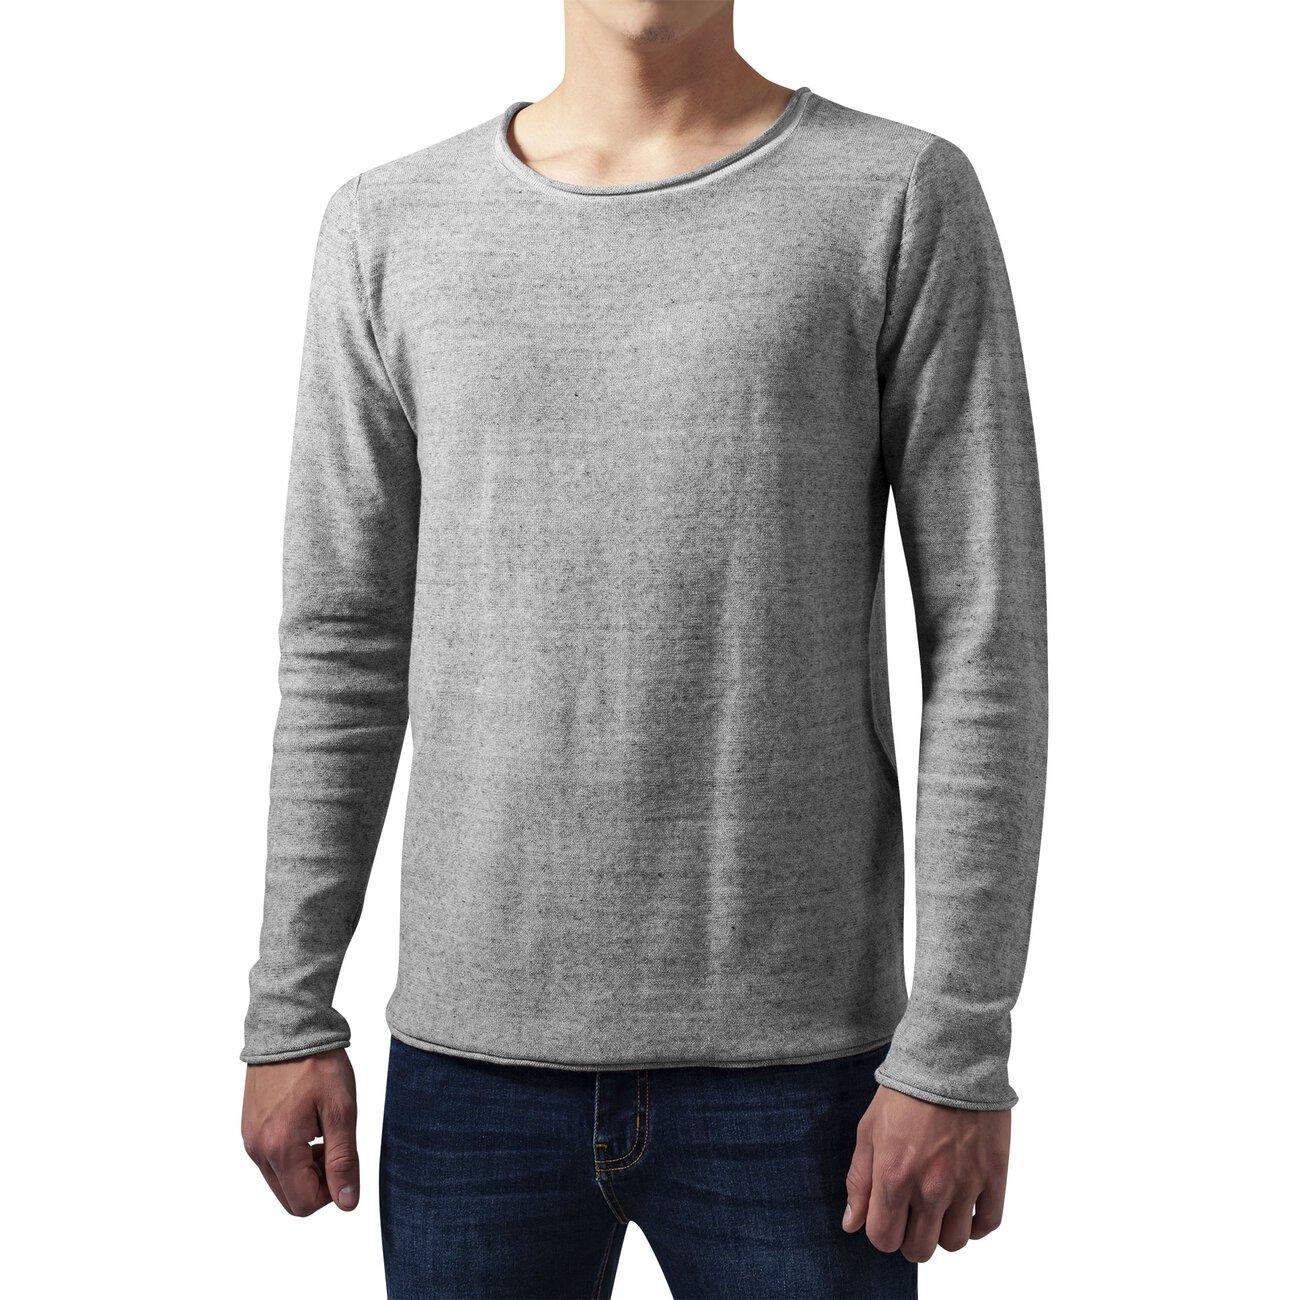 Feinstrick Pullover Herren Urban Classics Fine Knit